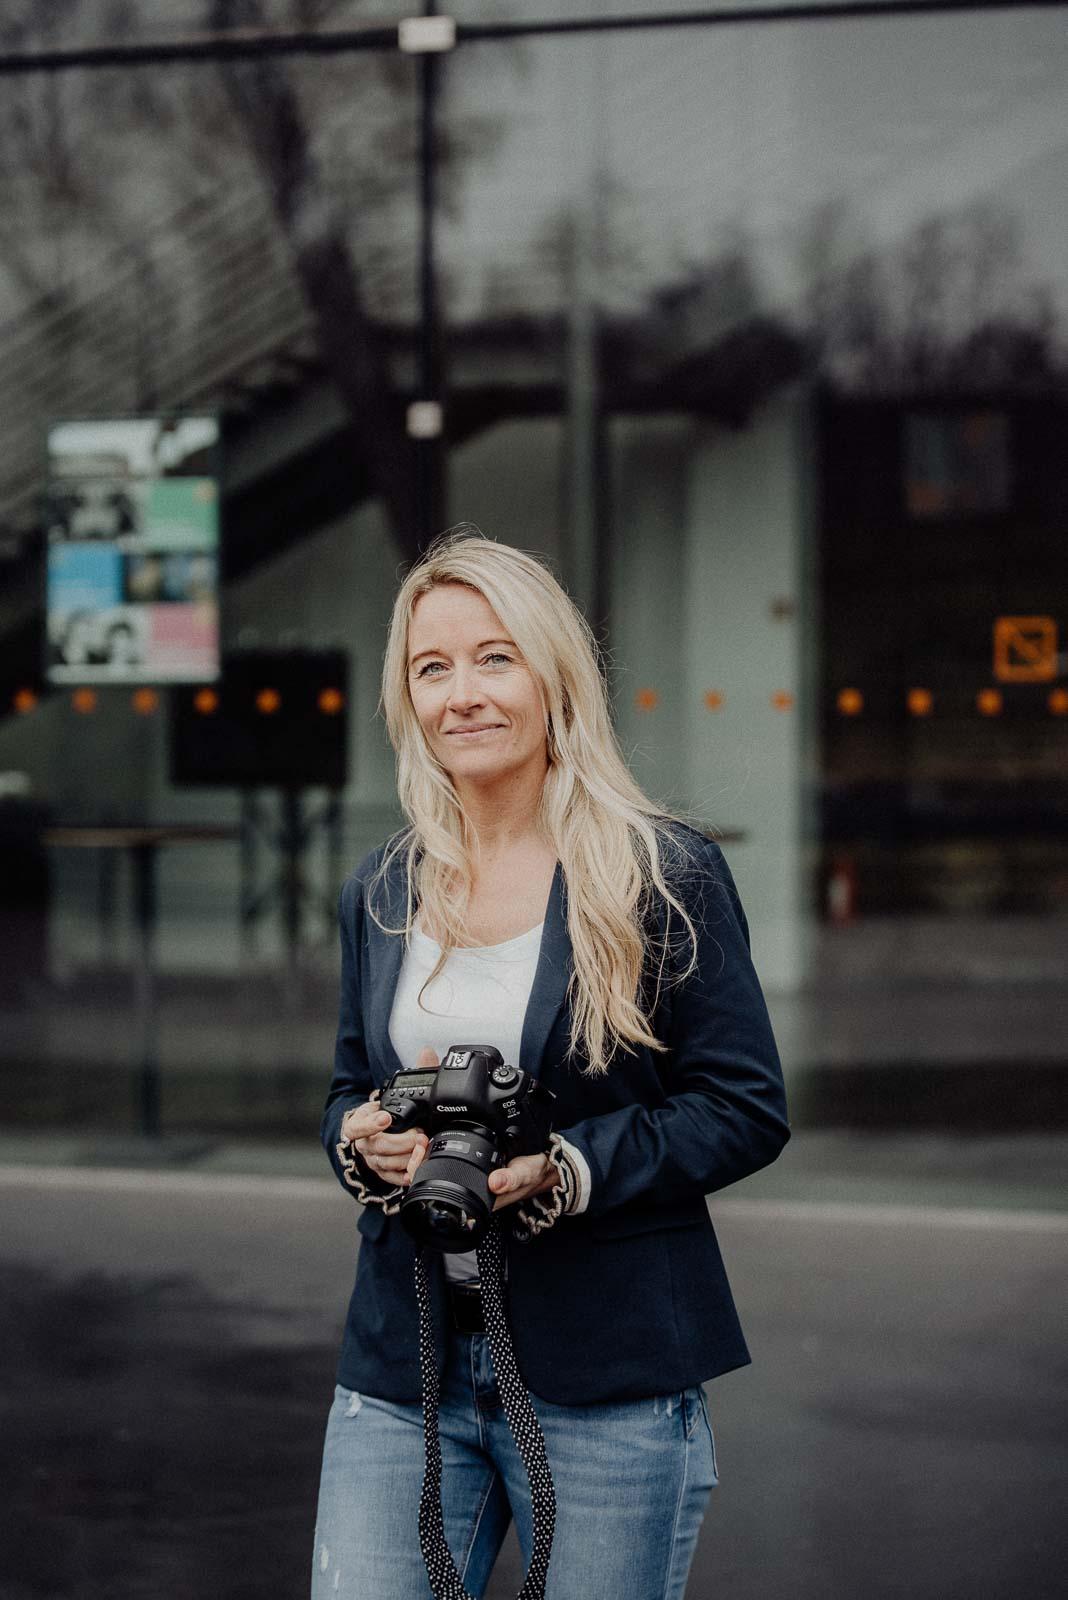 028-fotograf-witten-bochum-businessshooting-urban